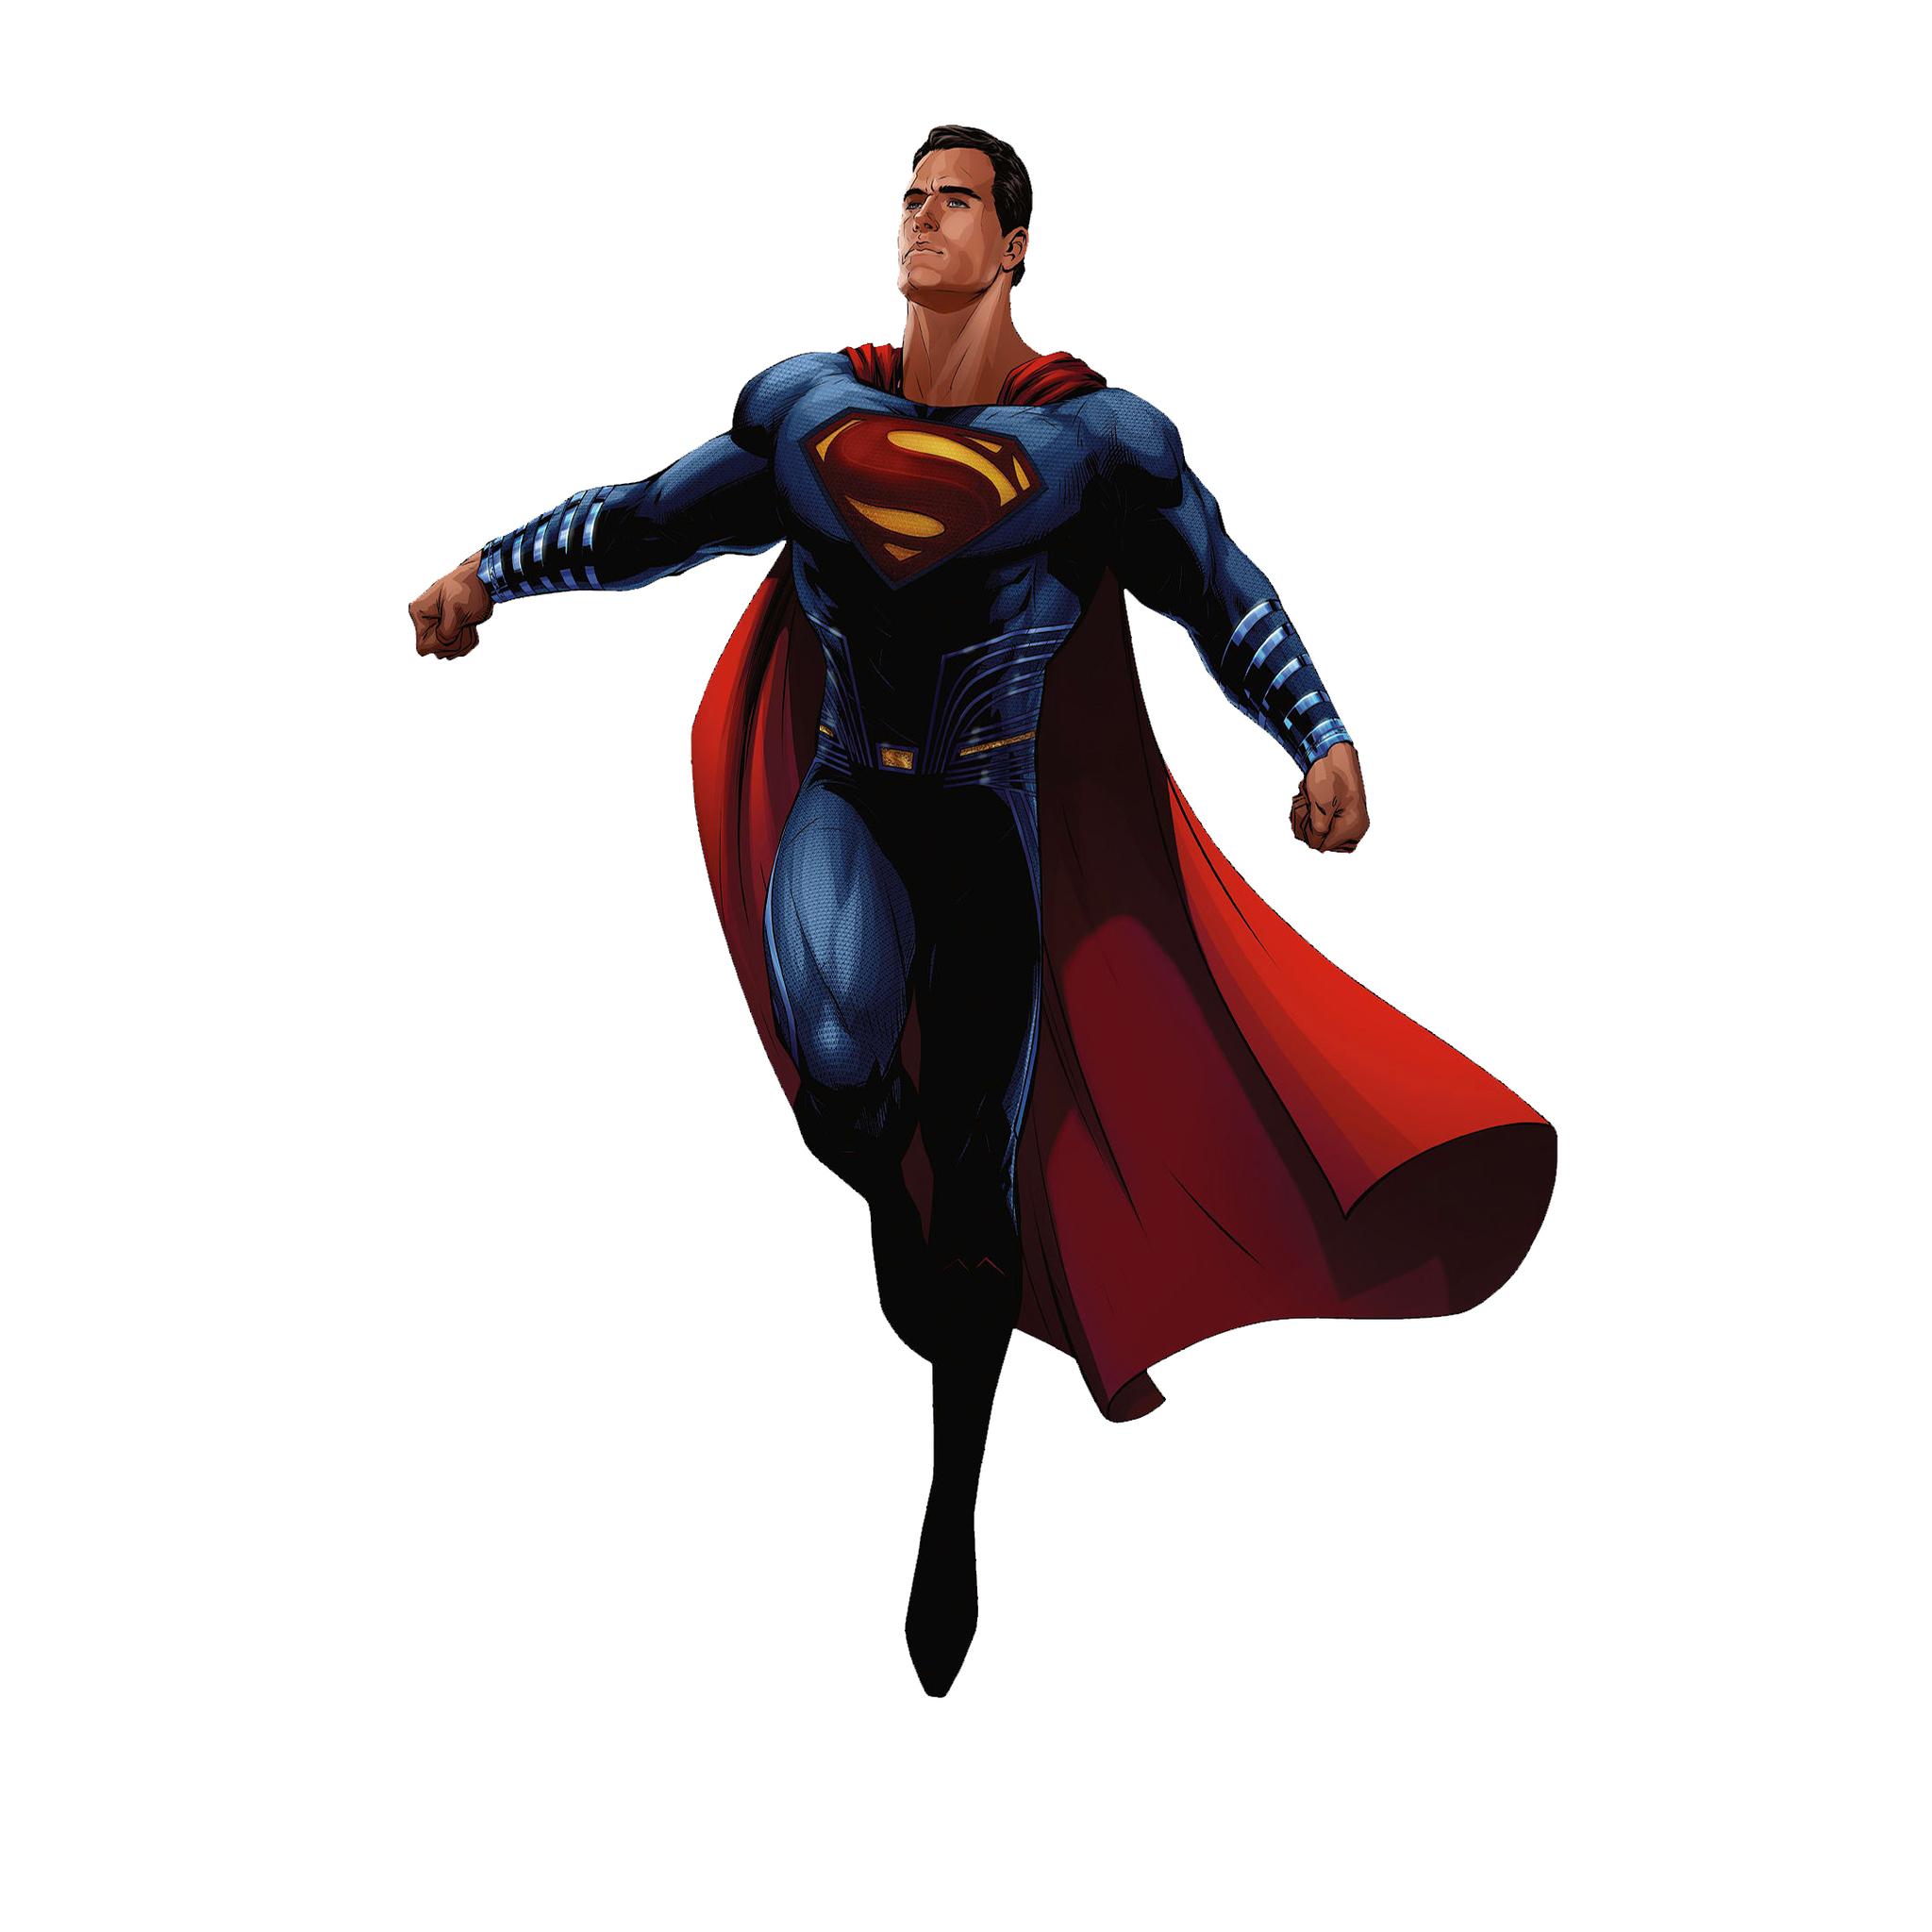 superman-dc-comic-artwork-nf.jpg